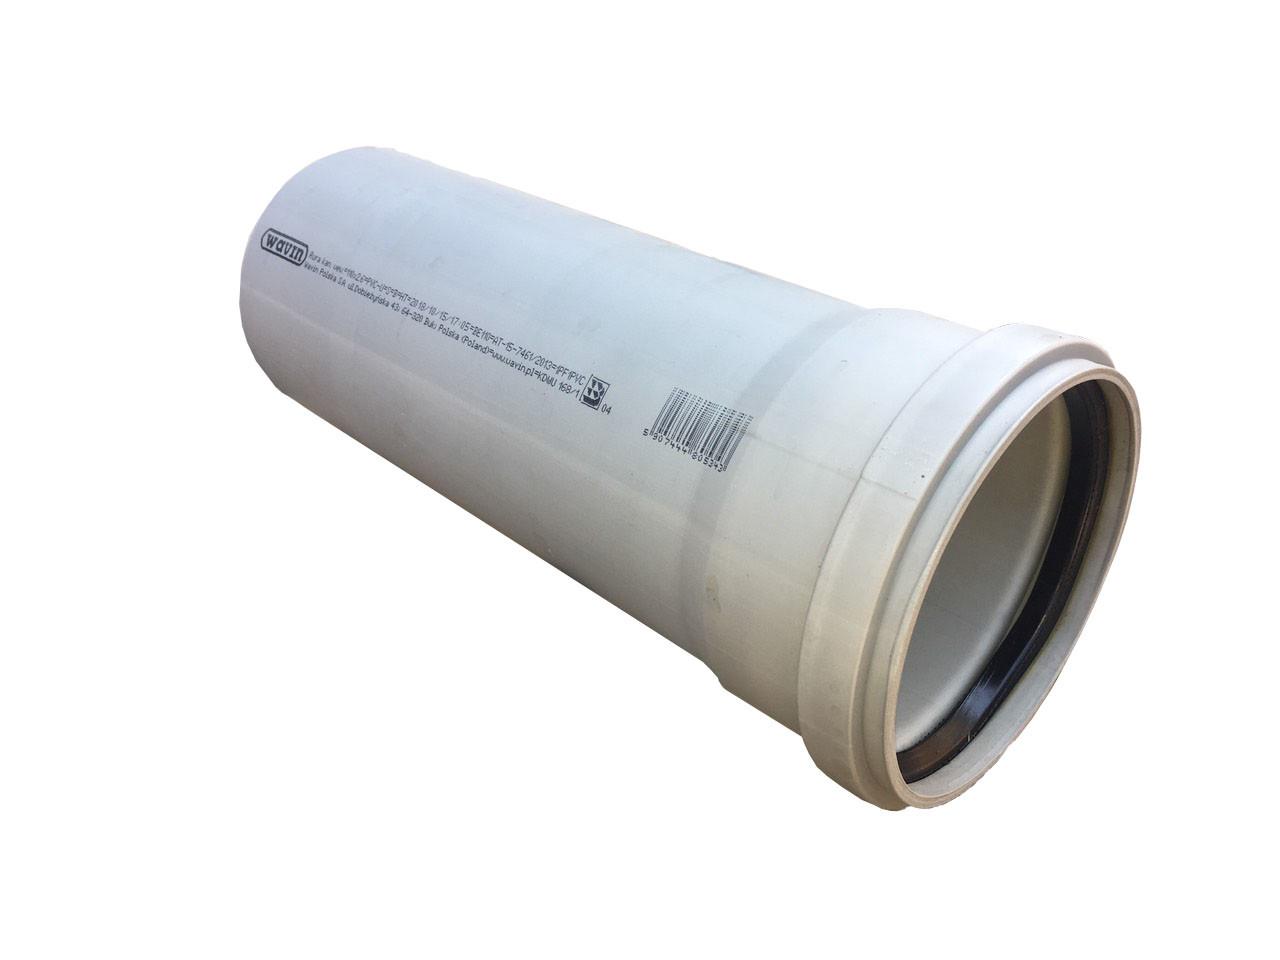 Труба для внутренней канализации 110*0.25 метра wavin